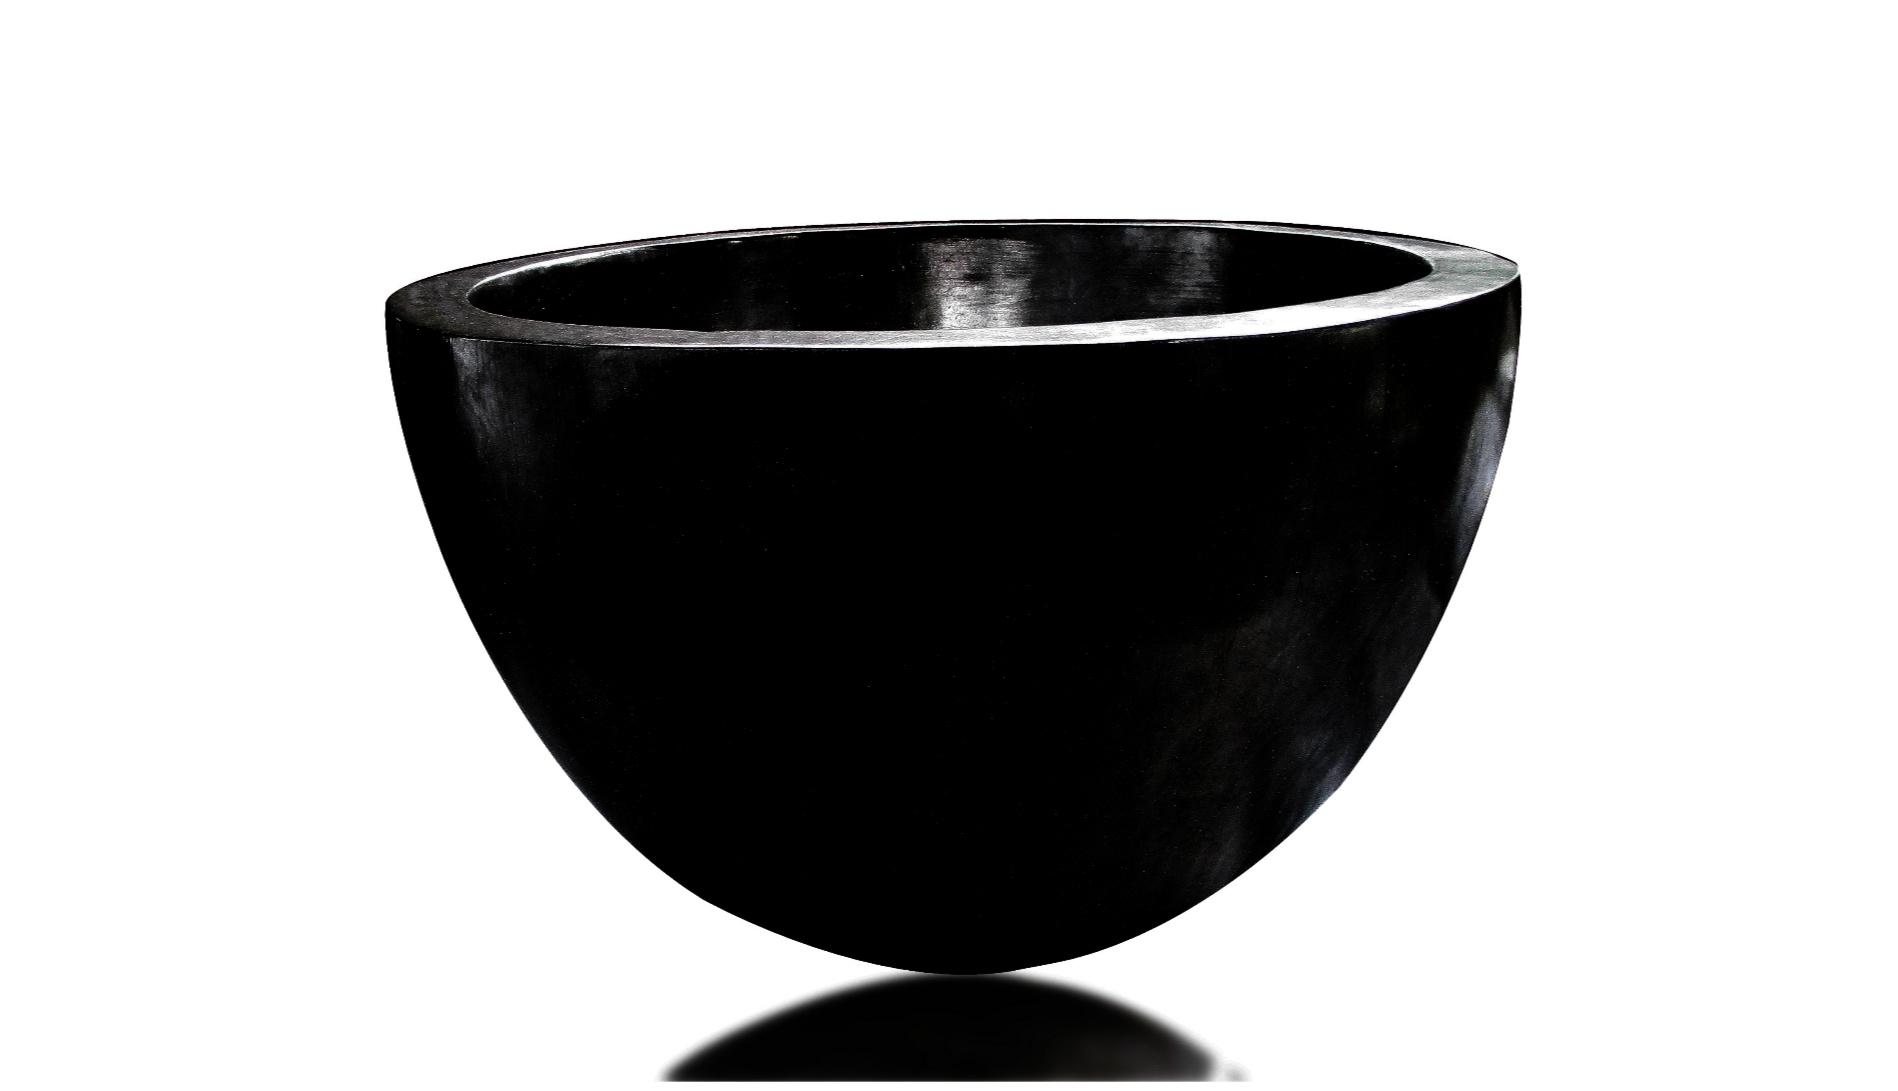 VENICE PLATER-DUCO BLACK